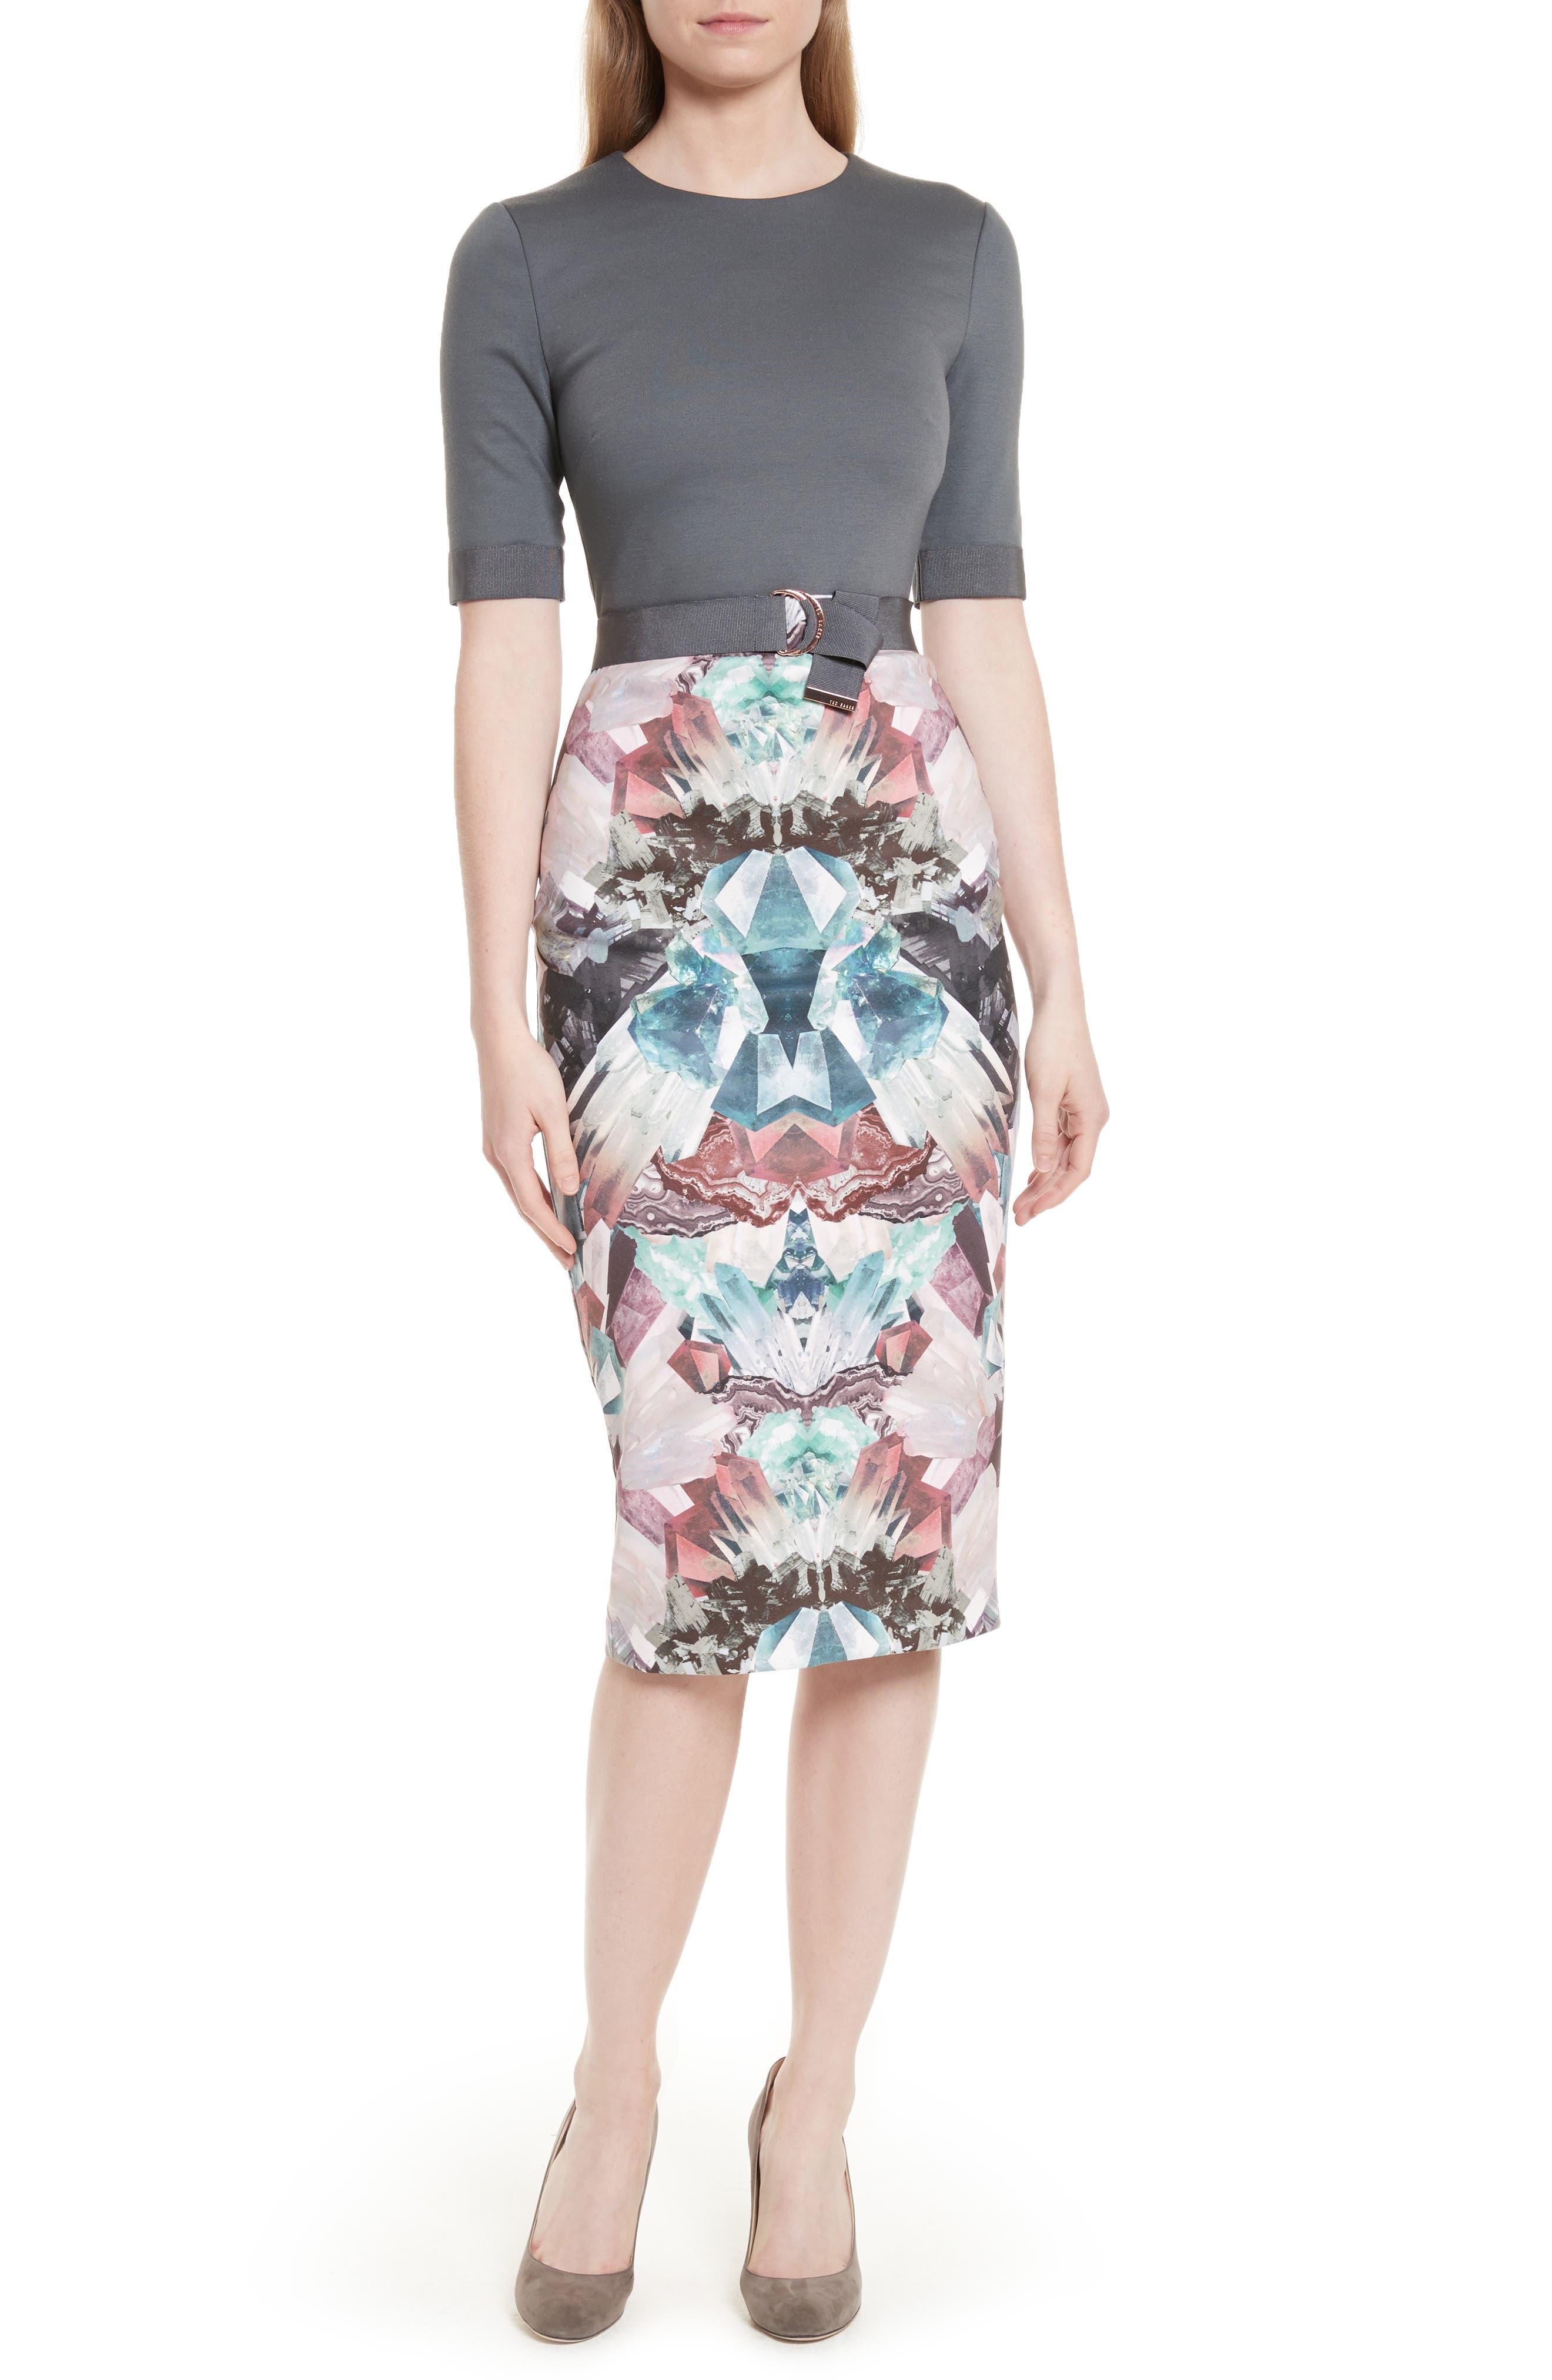 Anaste Mirror Minerals Print Dress,                             Main thumbnail 1, color,                             021